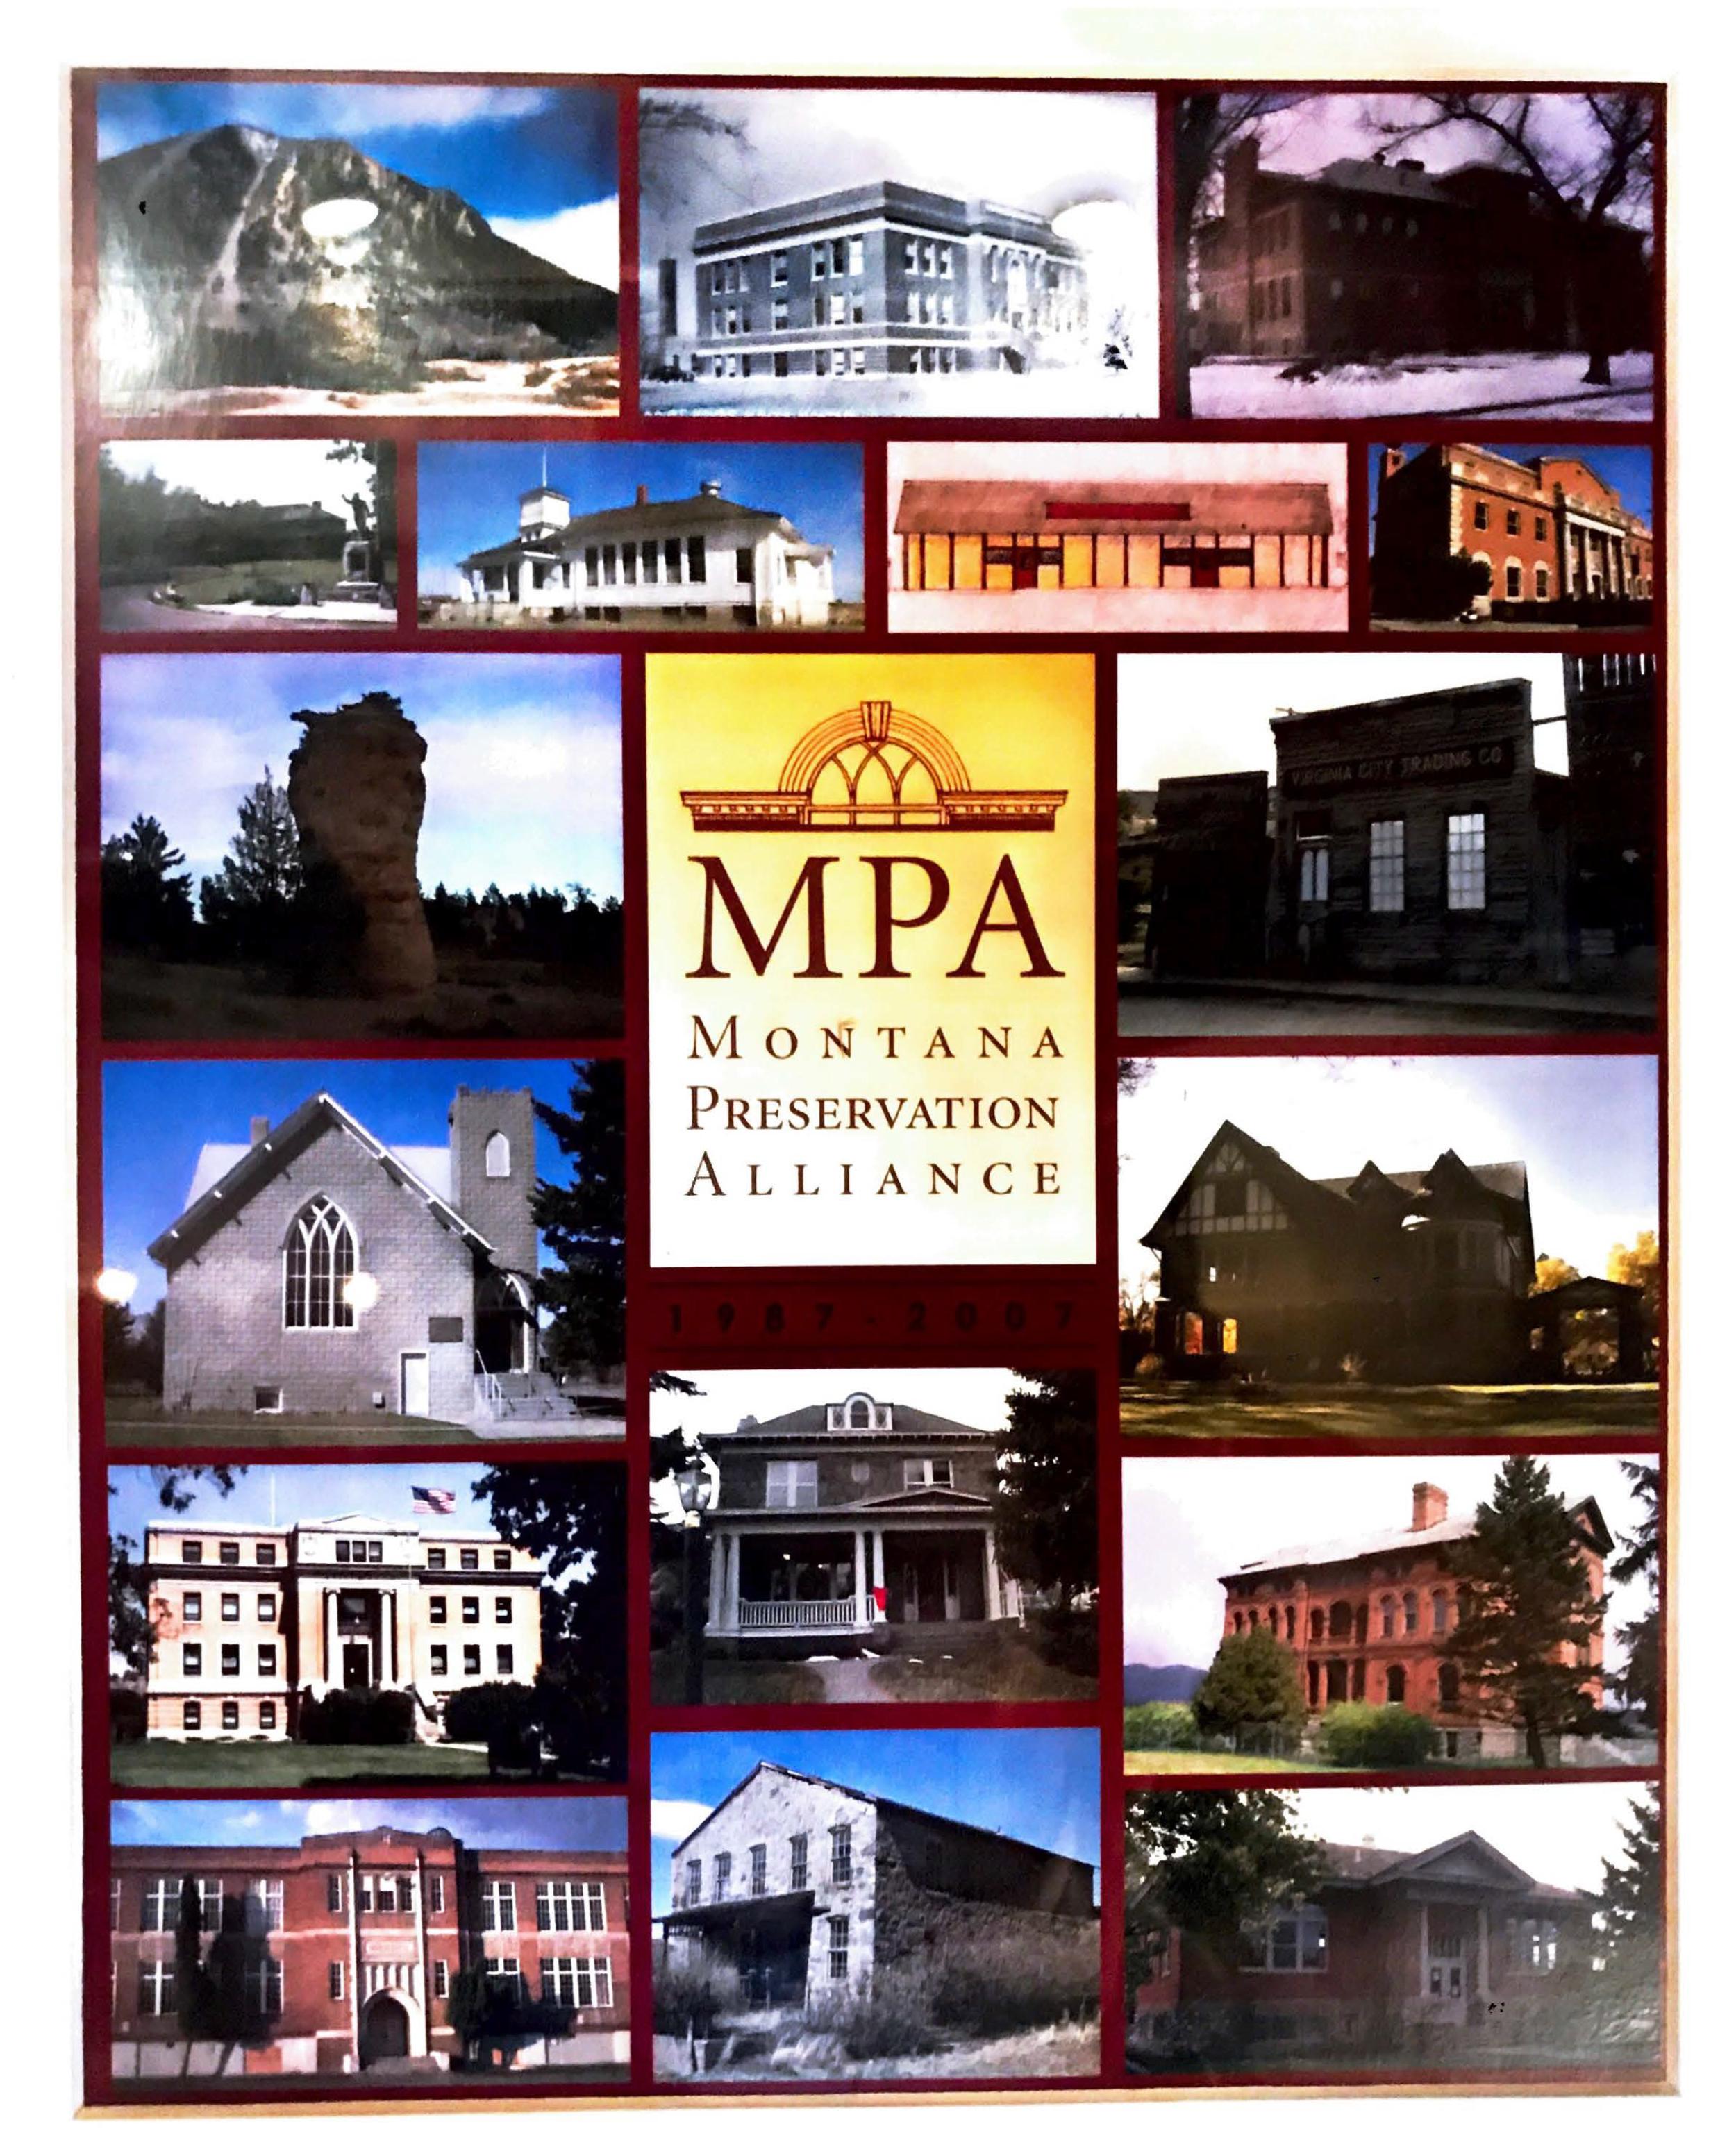 montana_preservation_alliance.png